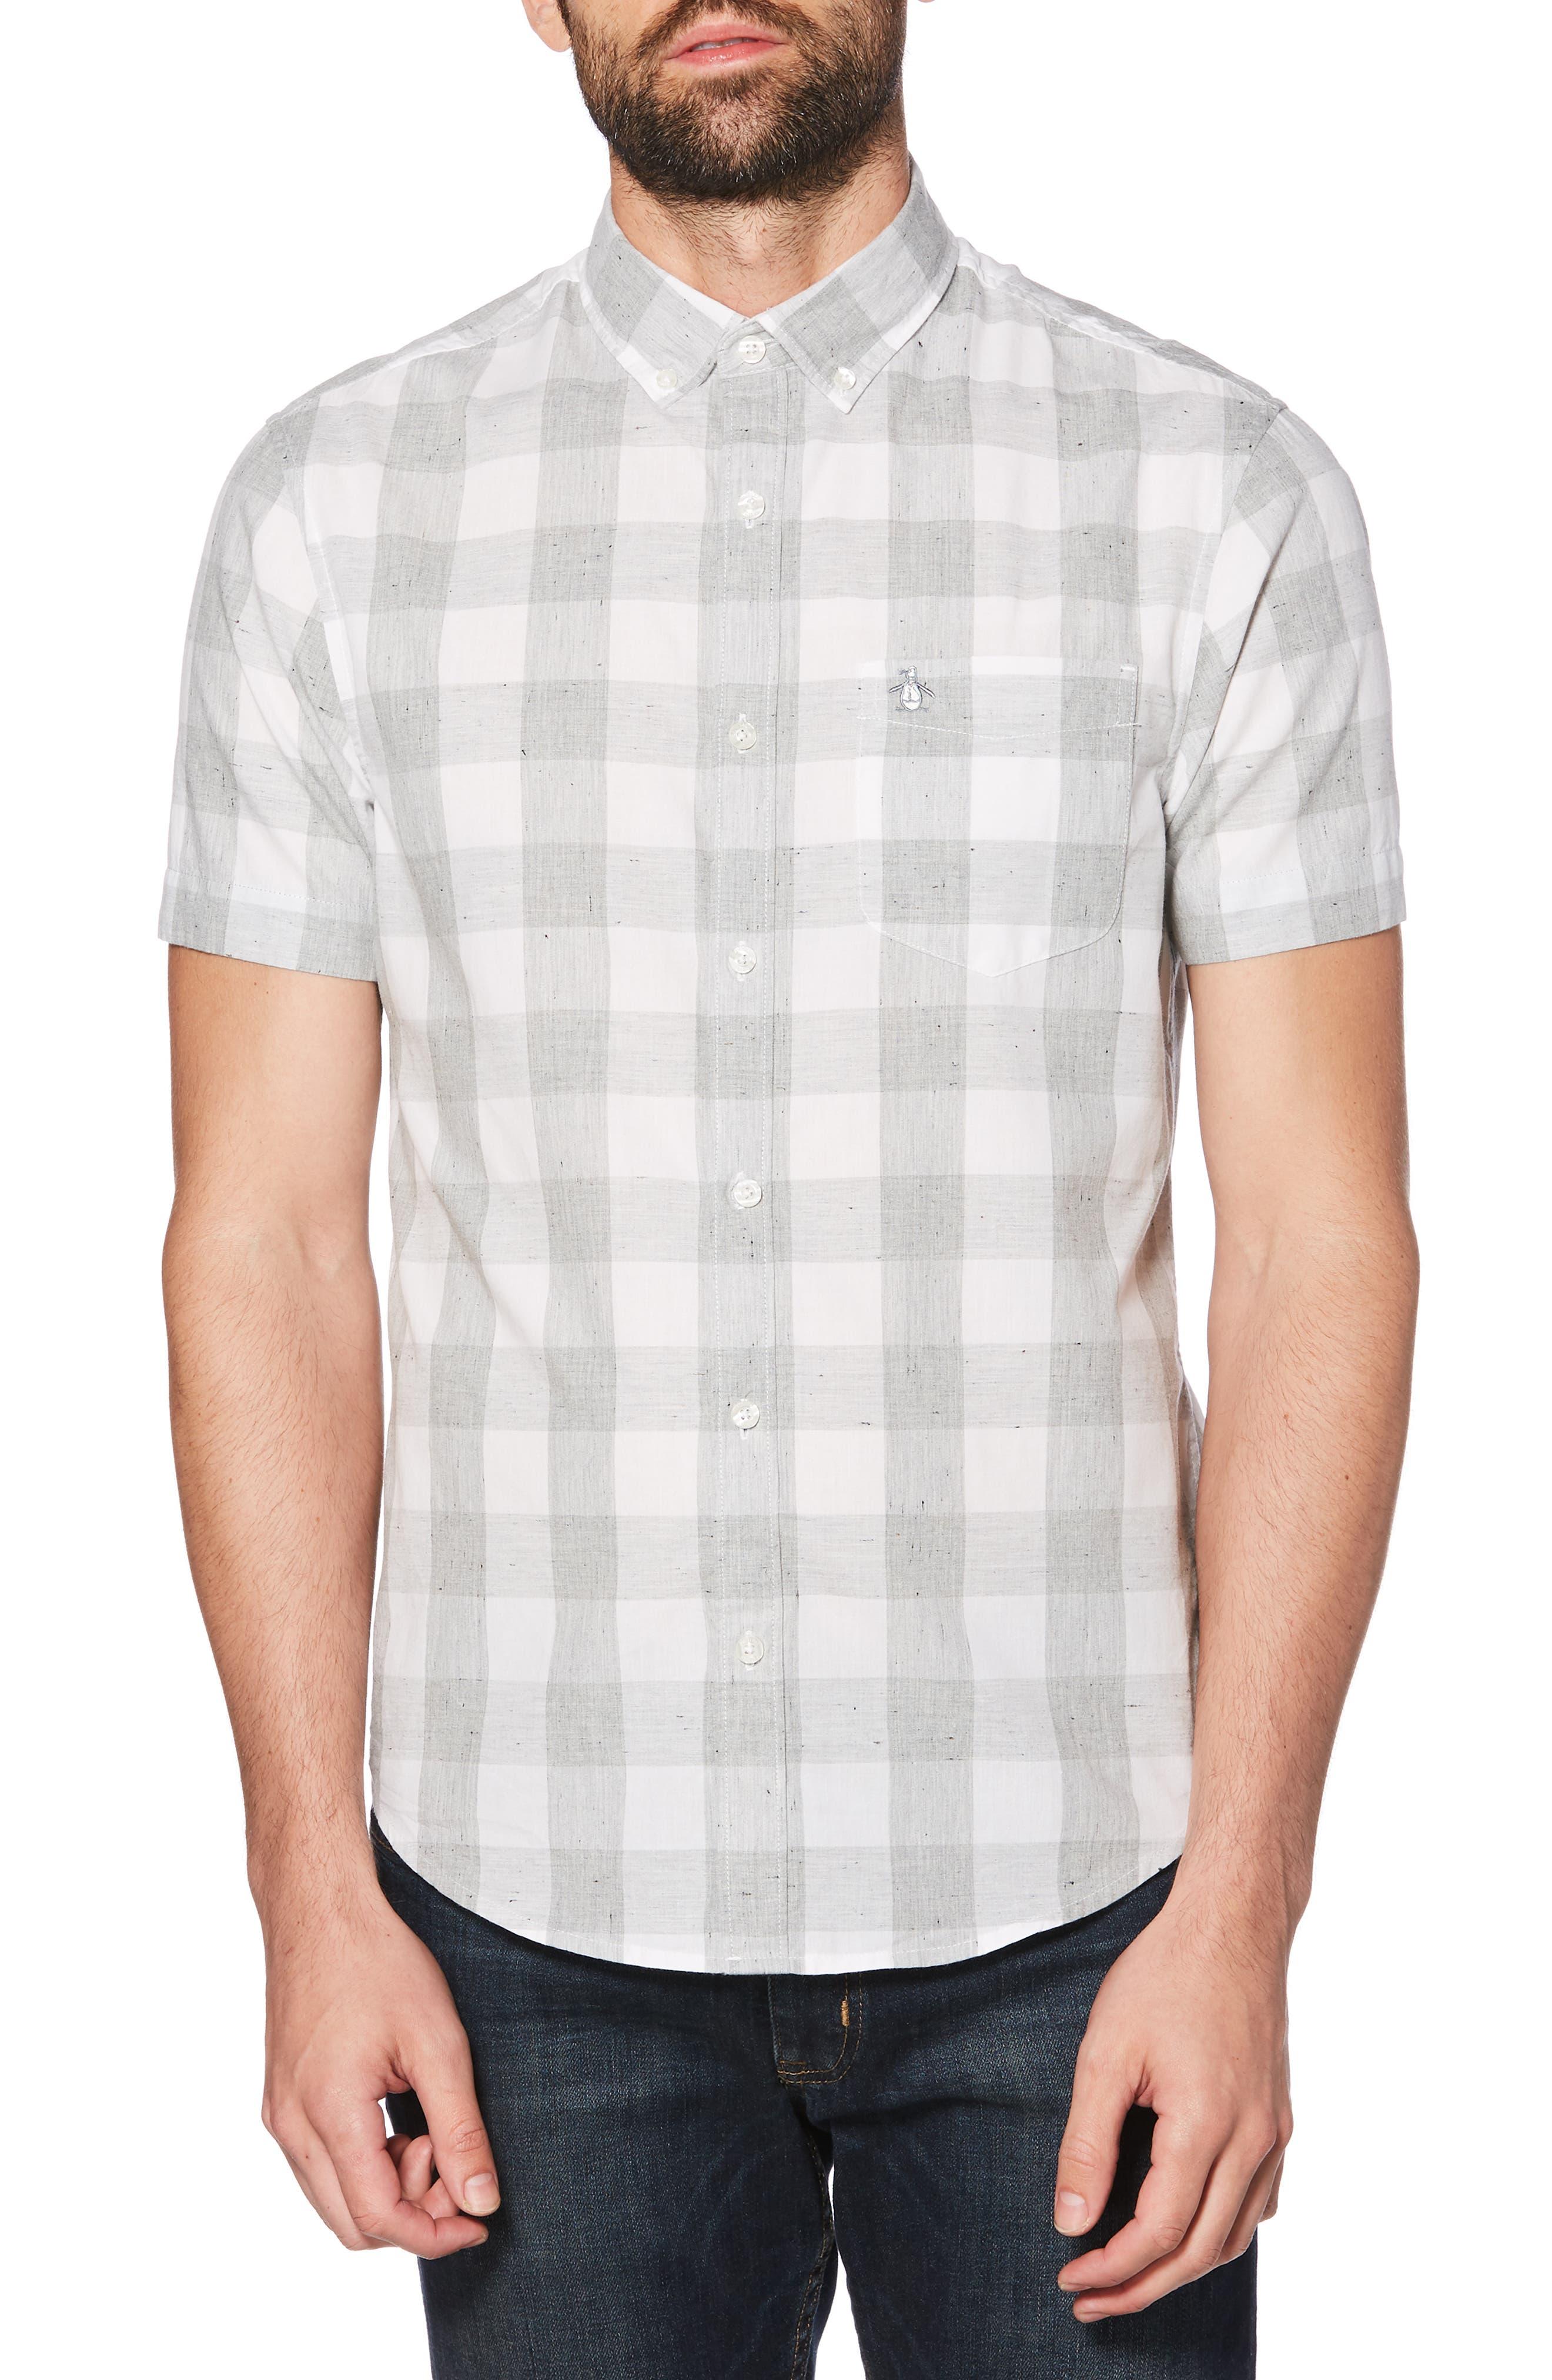 ORIGINAL PENGUIN Heather Buffalo Plaid Woven Shirt, Main, color, 037